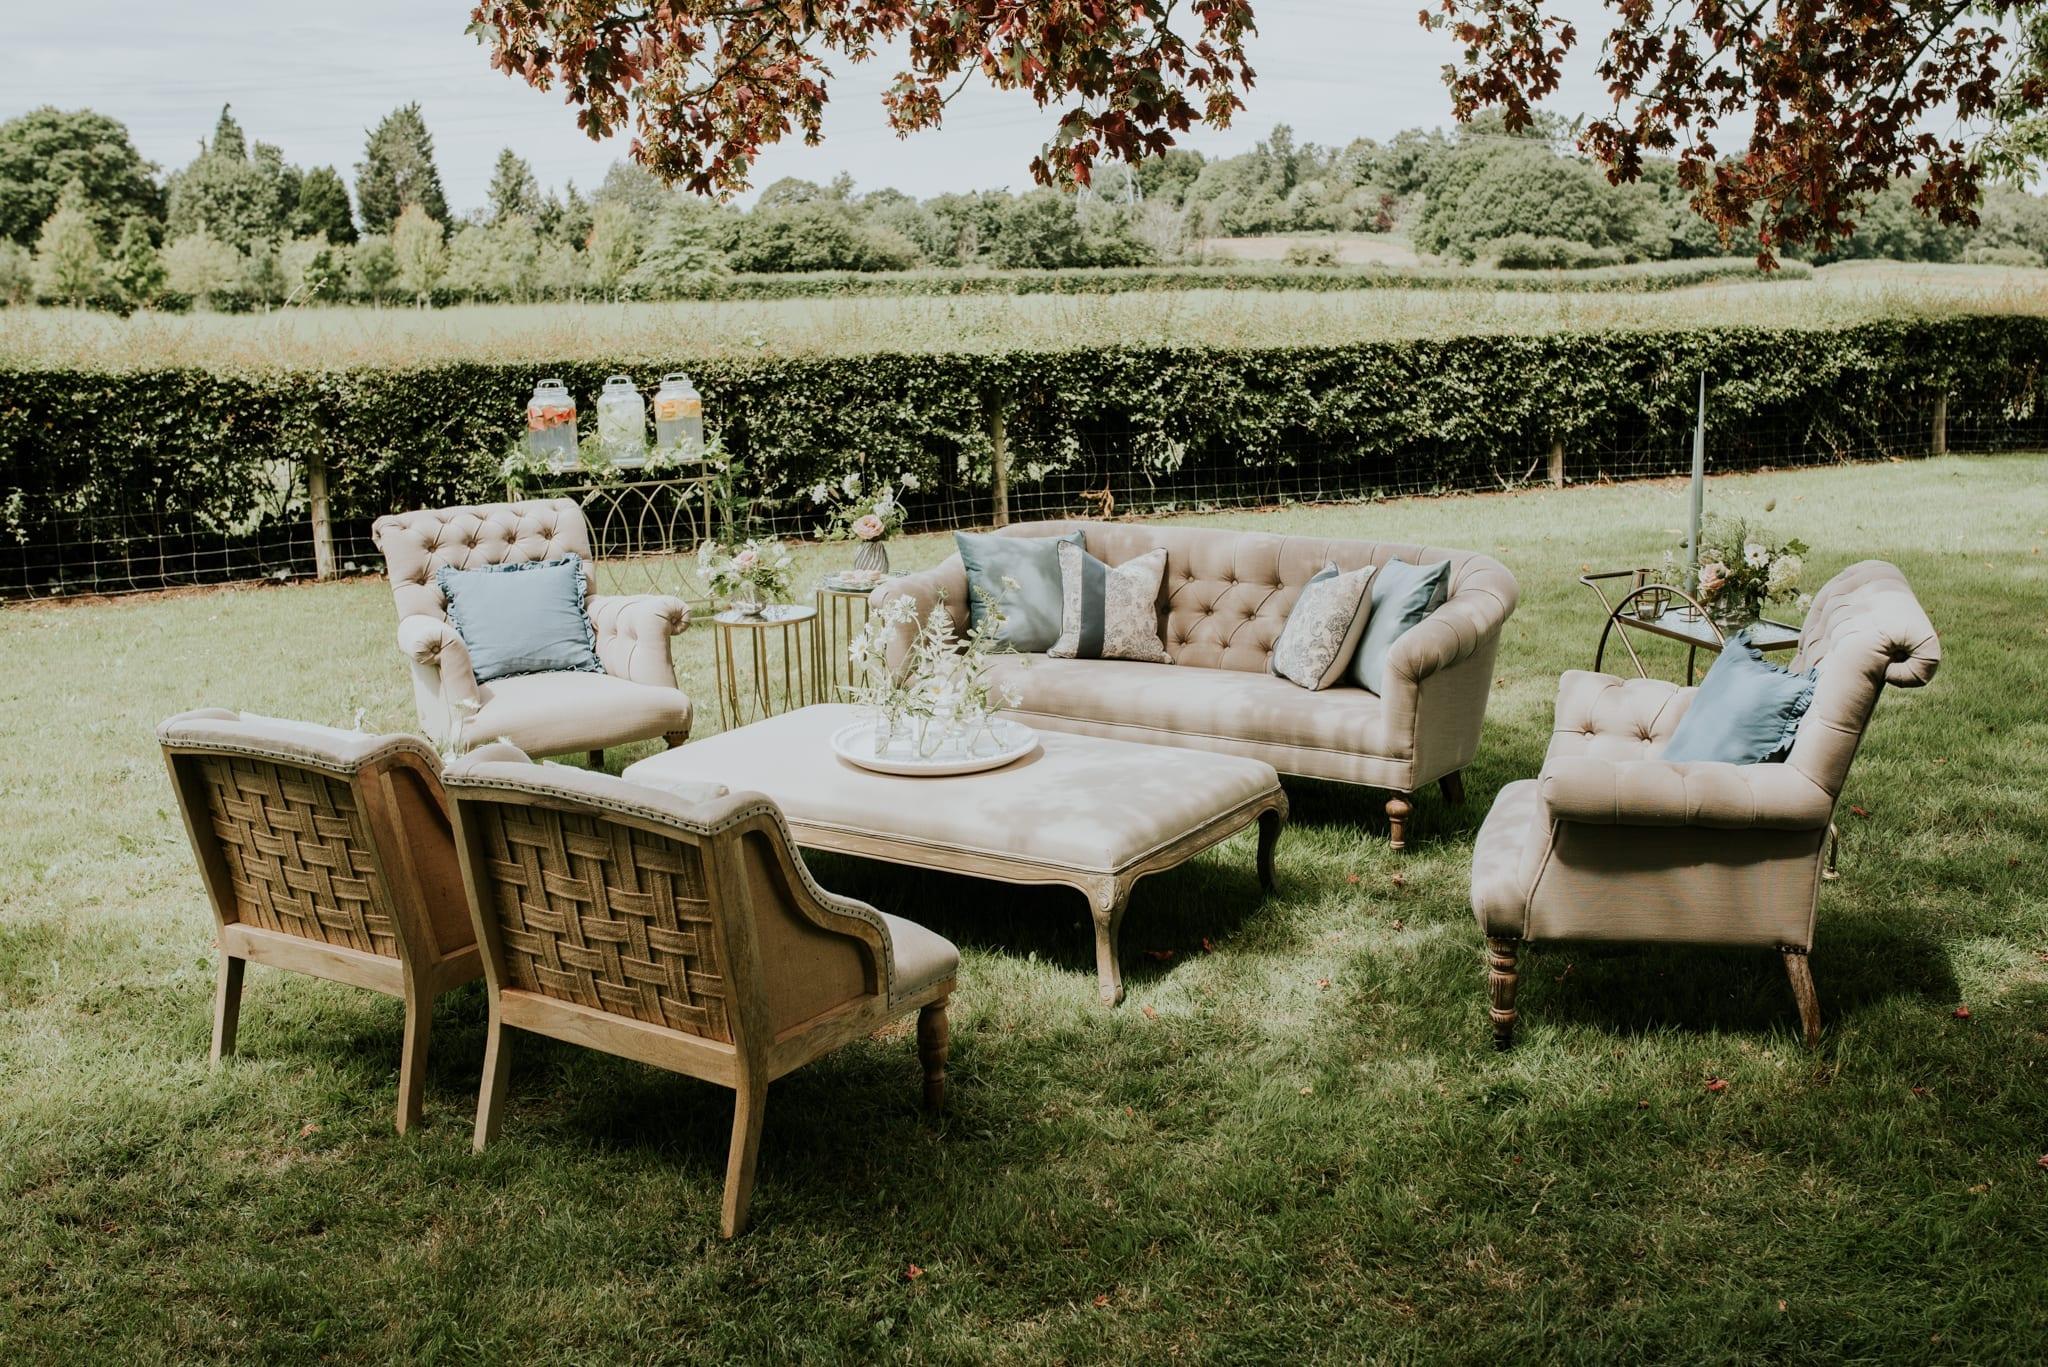 English Country Garden wedding lounge setting